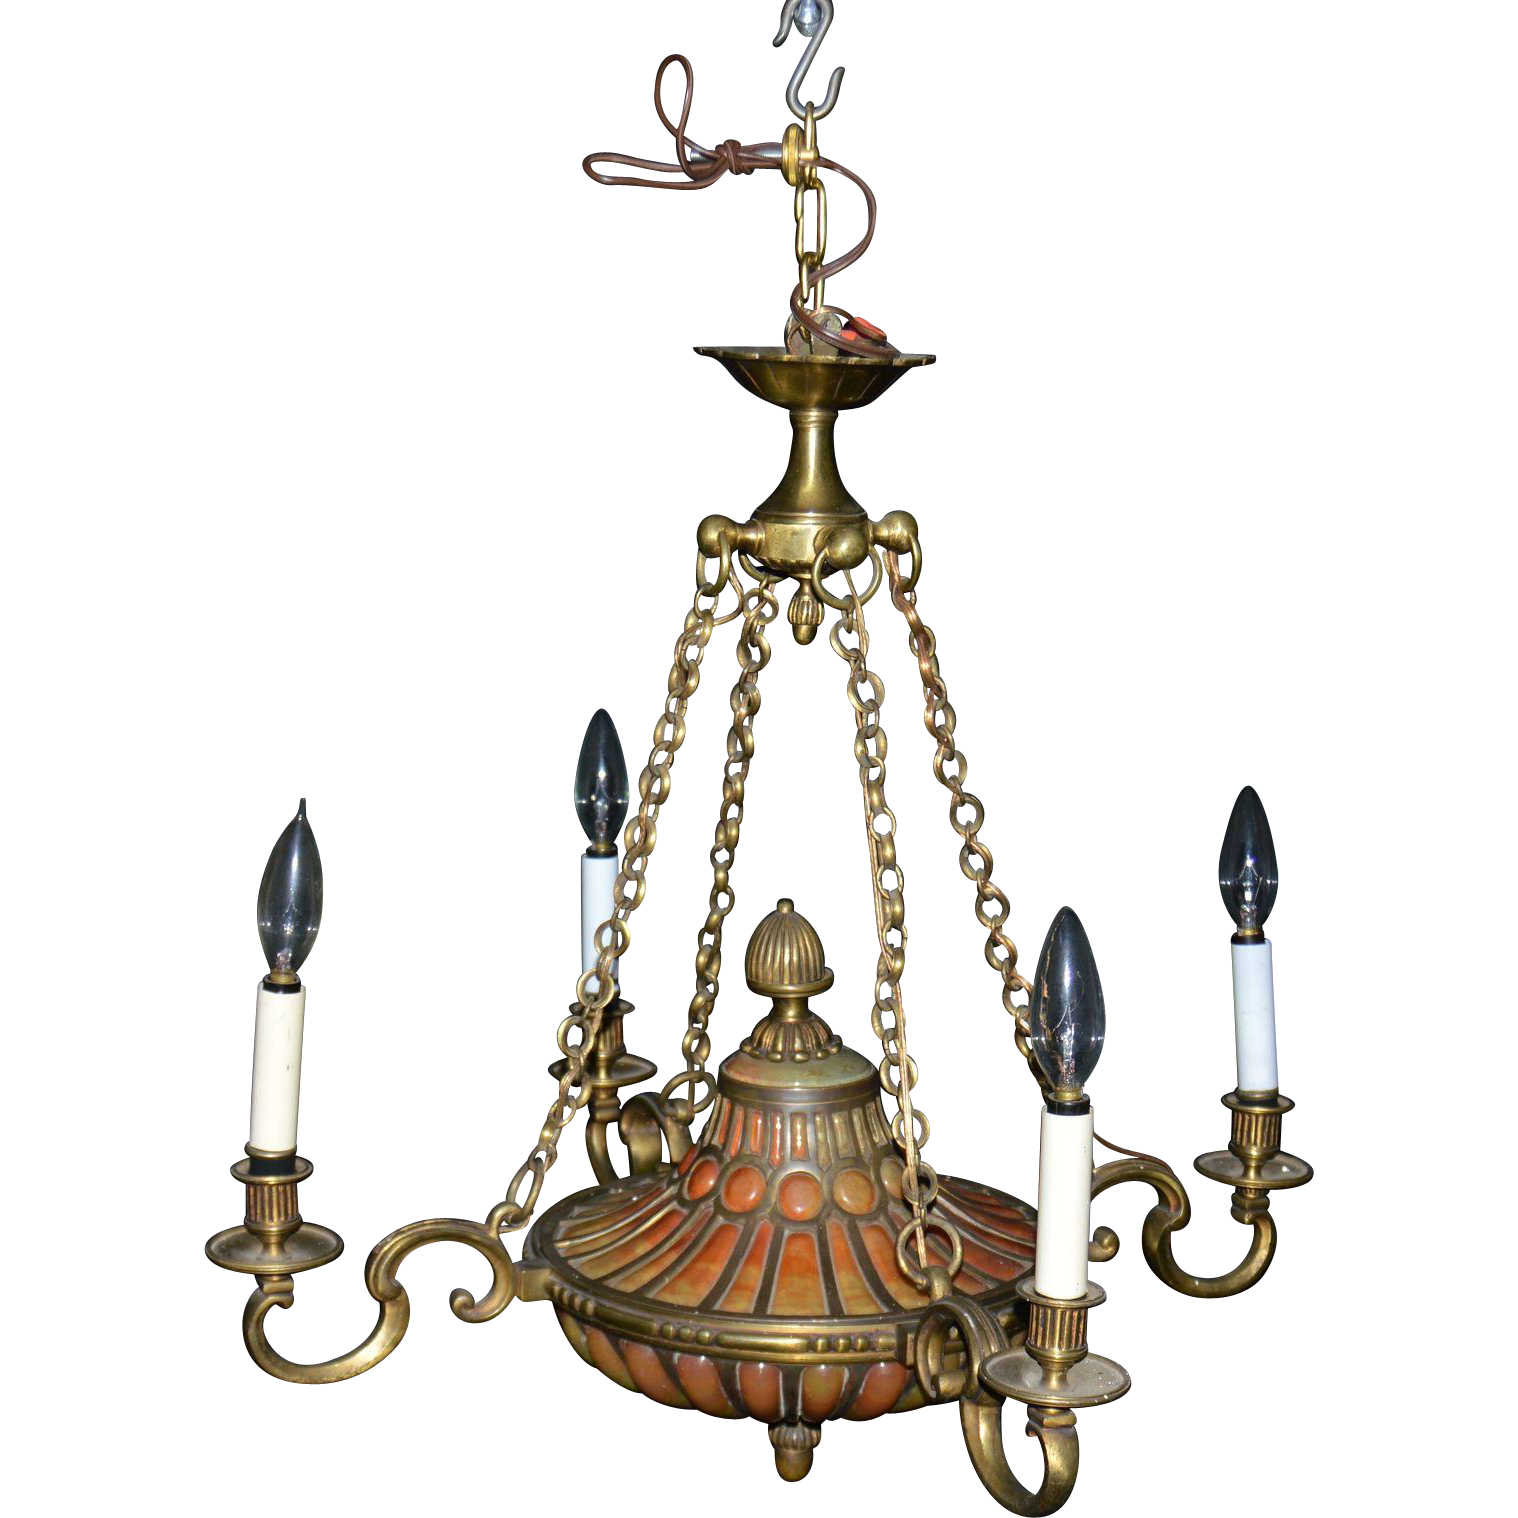 Daum nancy chandelier circa 1920s from hollin gate on ruby lane daum nancy chandelier circa 1920s arubaitofo Gallery